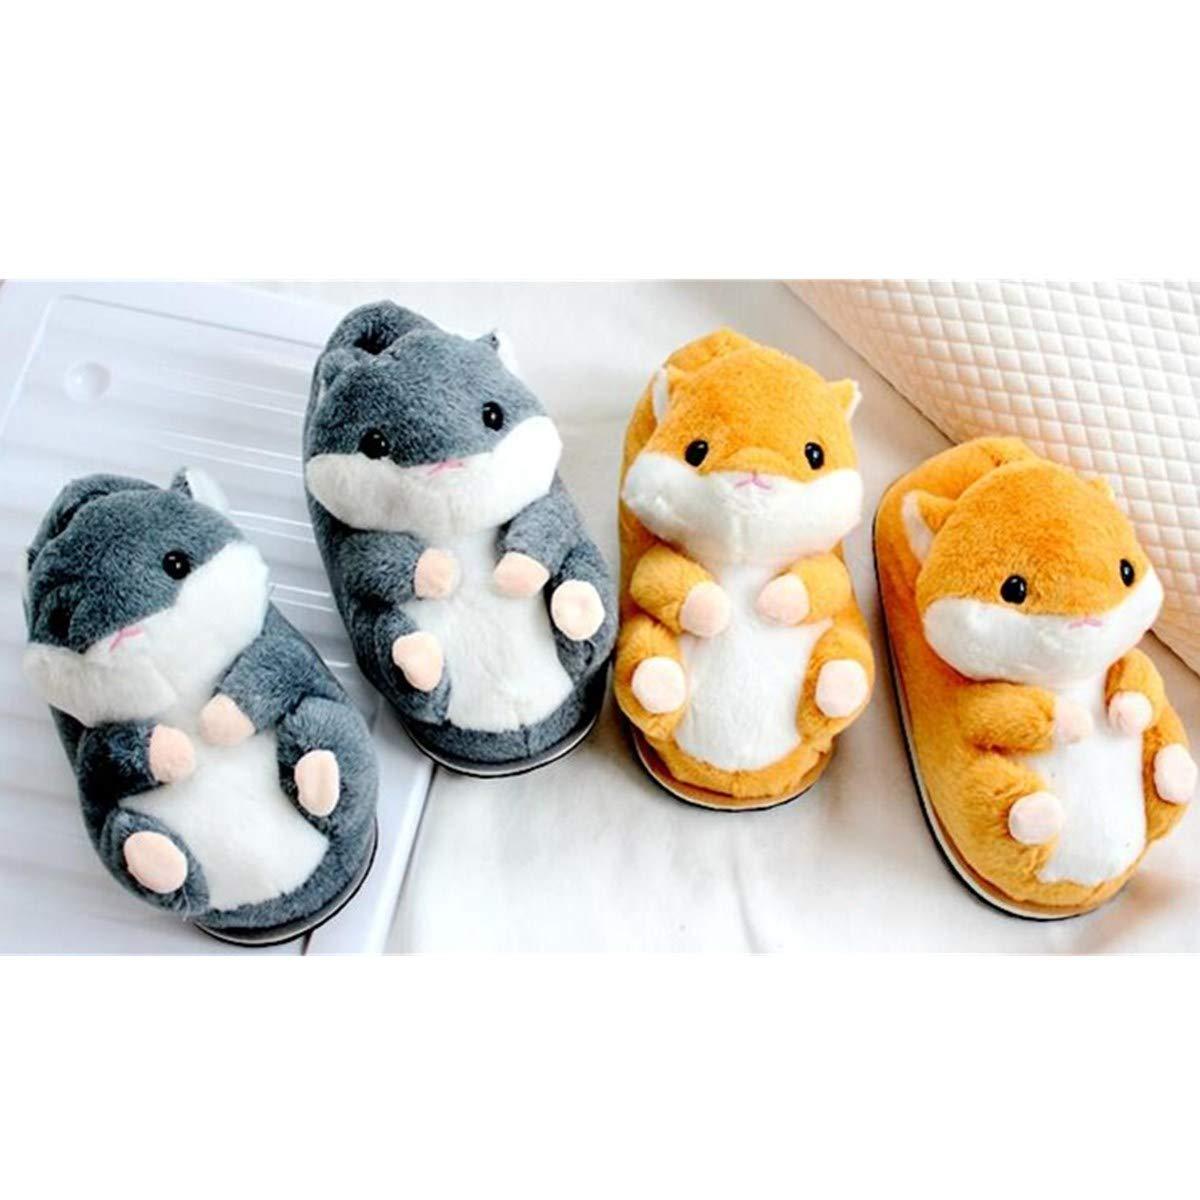 Rabbit Supermarket Super Cute Hamster Cotton Slippers, Winter Home Warm Non-Slip Cotton Slippers